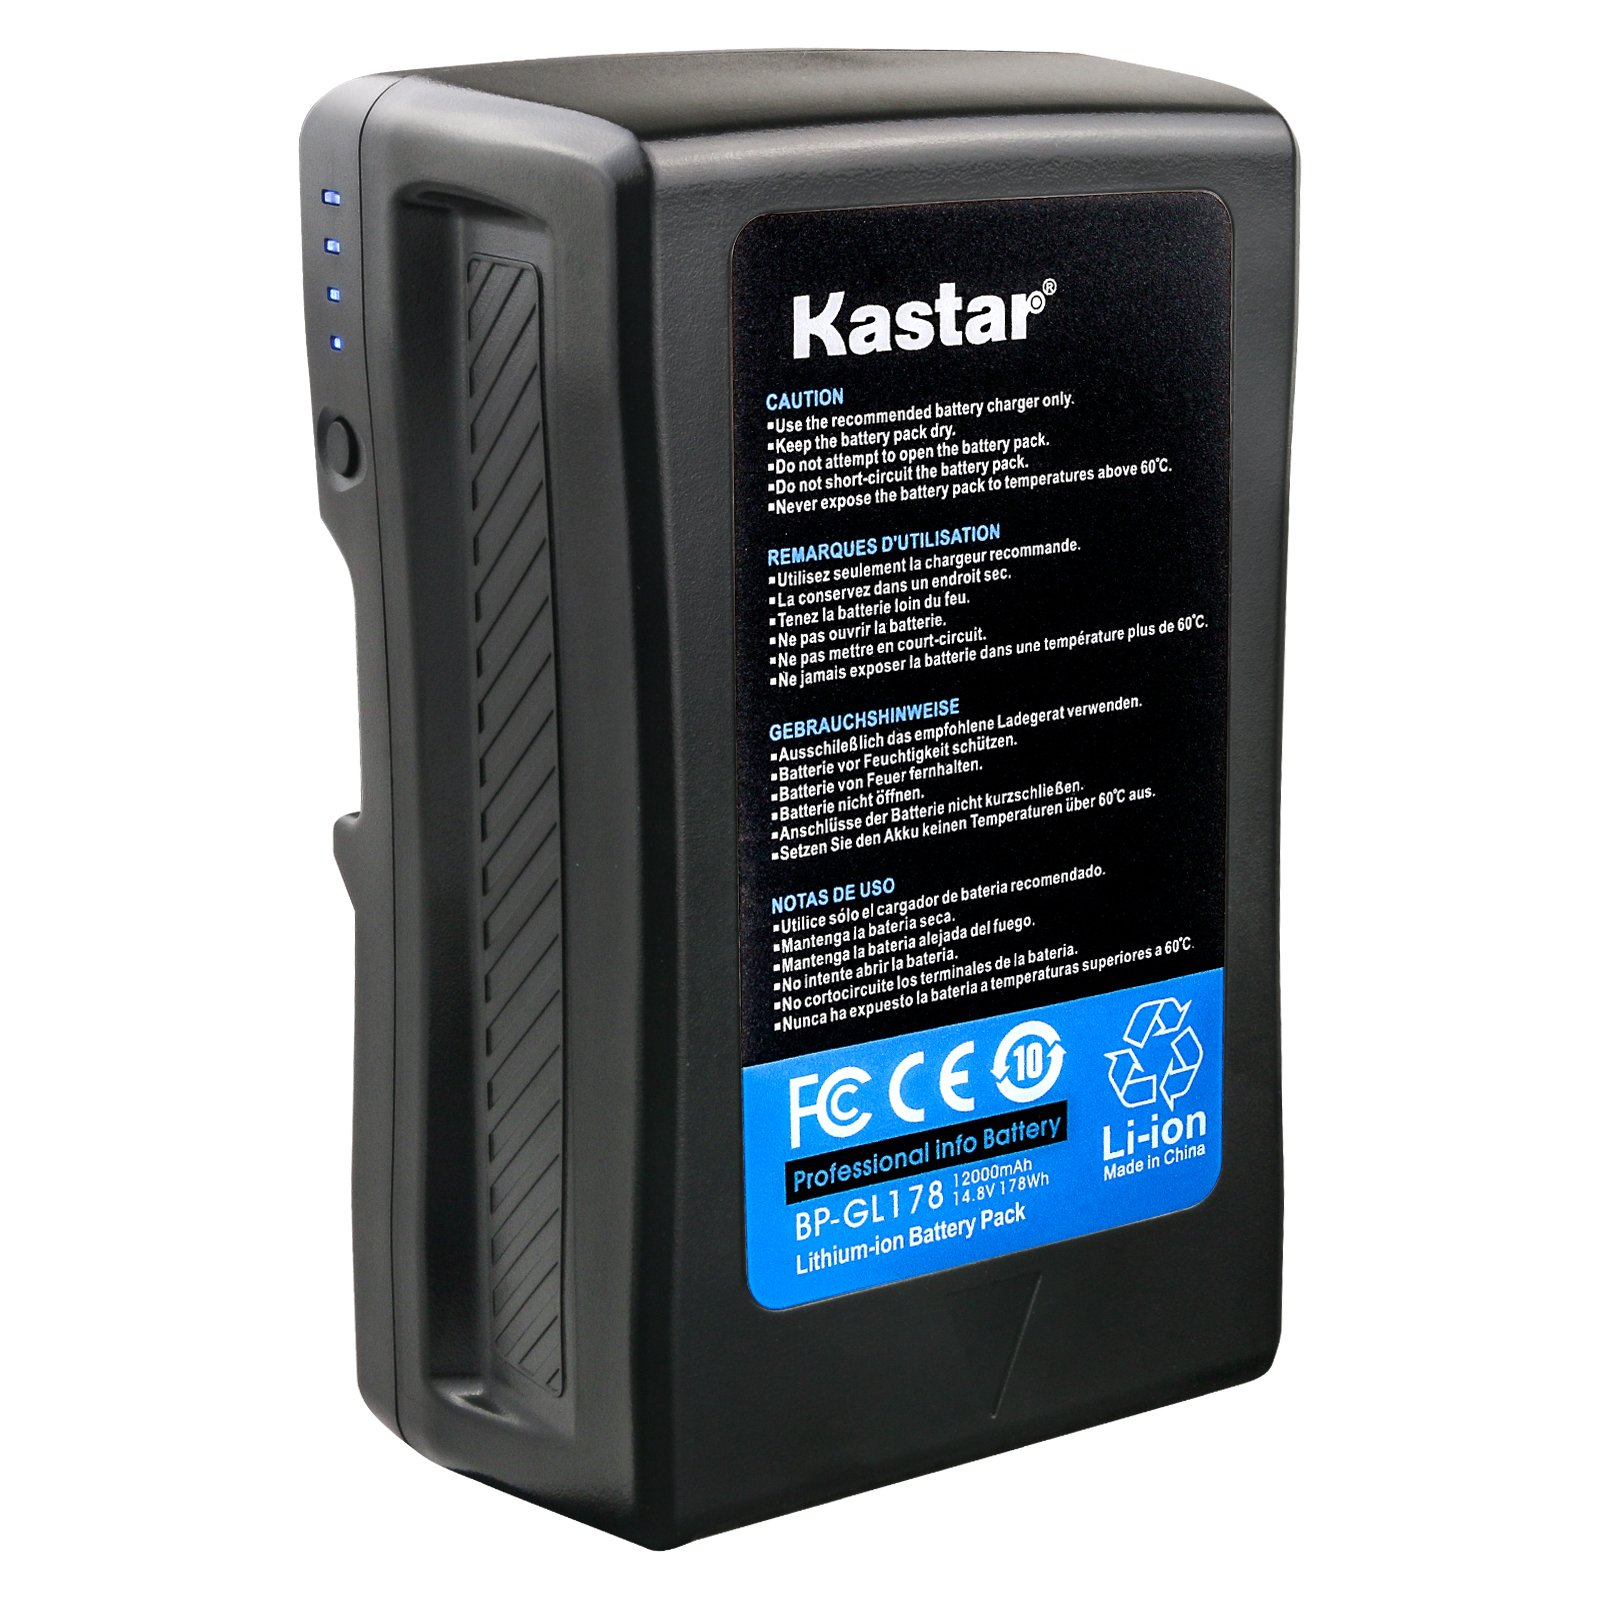 Kastar BP-GL178 Broadcast Replacement V Mount Battery, 14.8V 12000mAh 178Wh for Sony PMW-EX330K PMW-EX330L PMW-580K PMW580L PDW-680 PDW-700 PDW-850 PMW-TD300 HDW-F900R HDW-680 HDW-800P PMW-F55 PMW-F5 by Kastar (Image #1)